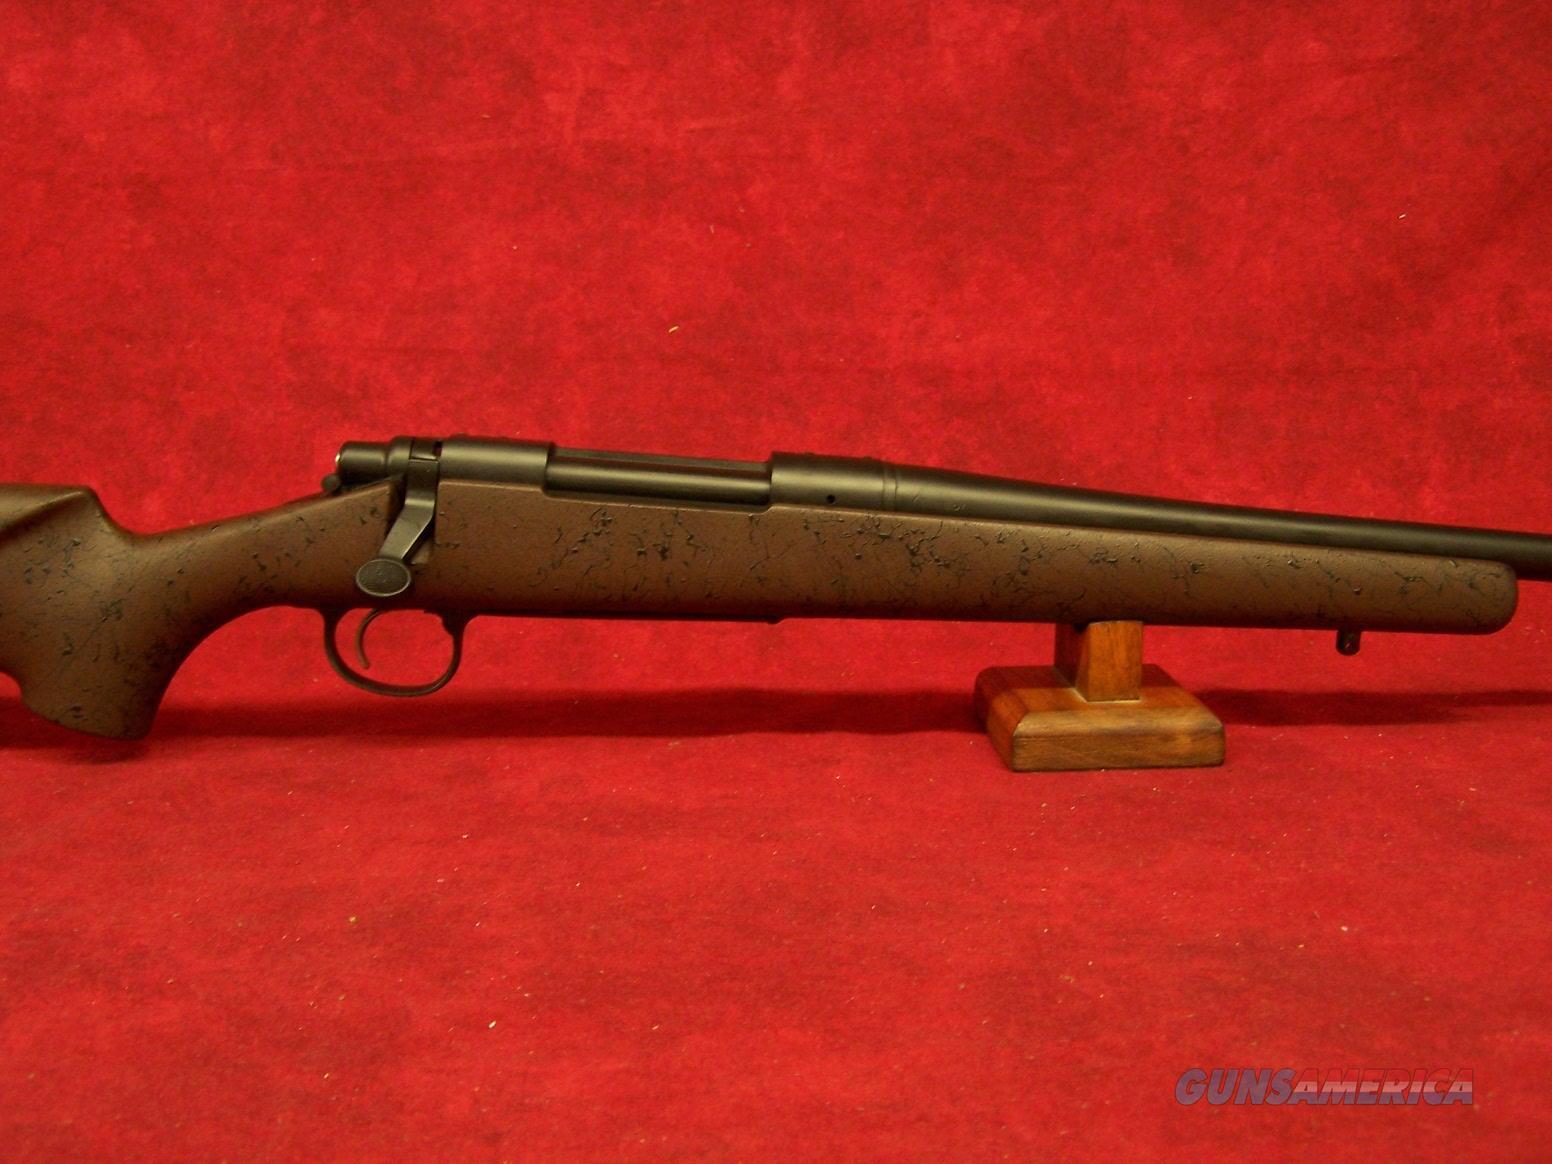 "Remington 700 American Wilderness Rifle 7mm Mag 24"" Barrel Black Cerakote Finish Grayboe Stock (84552)  Guns > Rifles > Remington Rifles - Modern > Model 700 > Sporting"